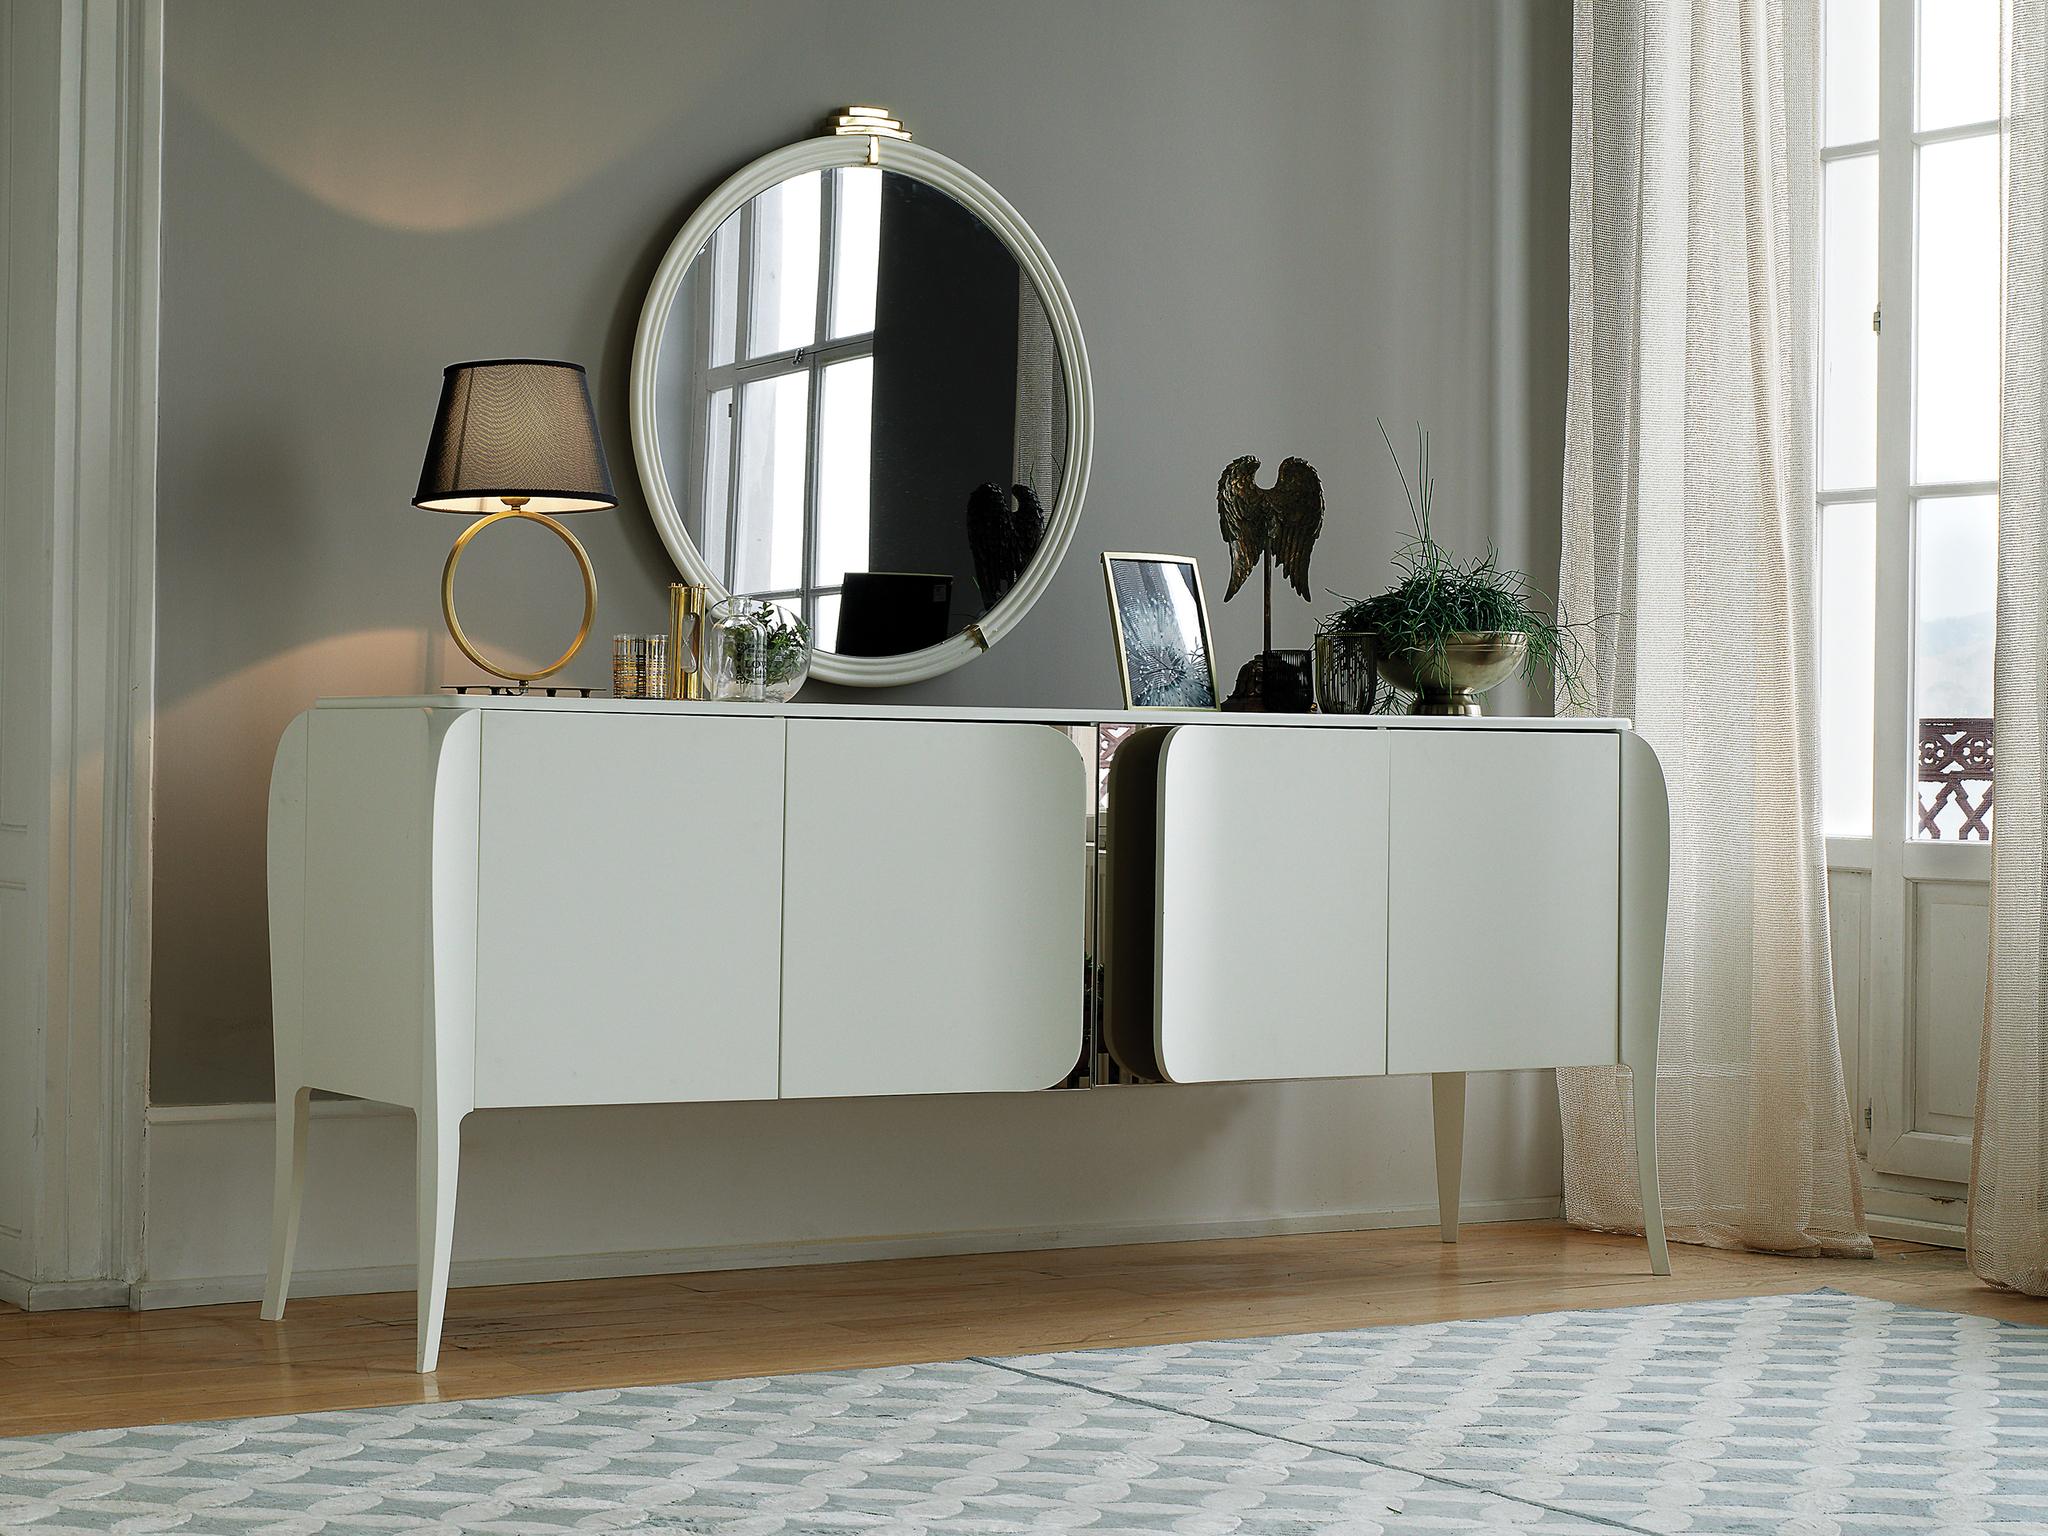 Зеркало ANGEL (92x96x3,5) Enza Home белый и сервант ANGEL (гостиная) белый